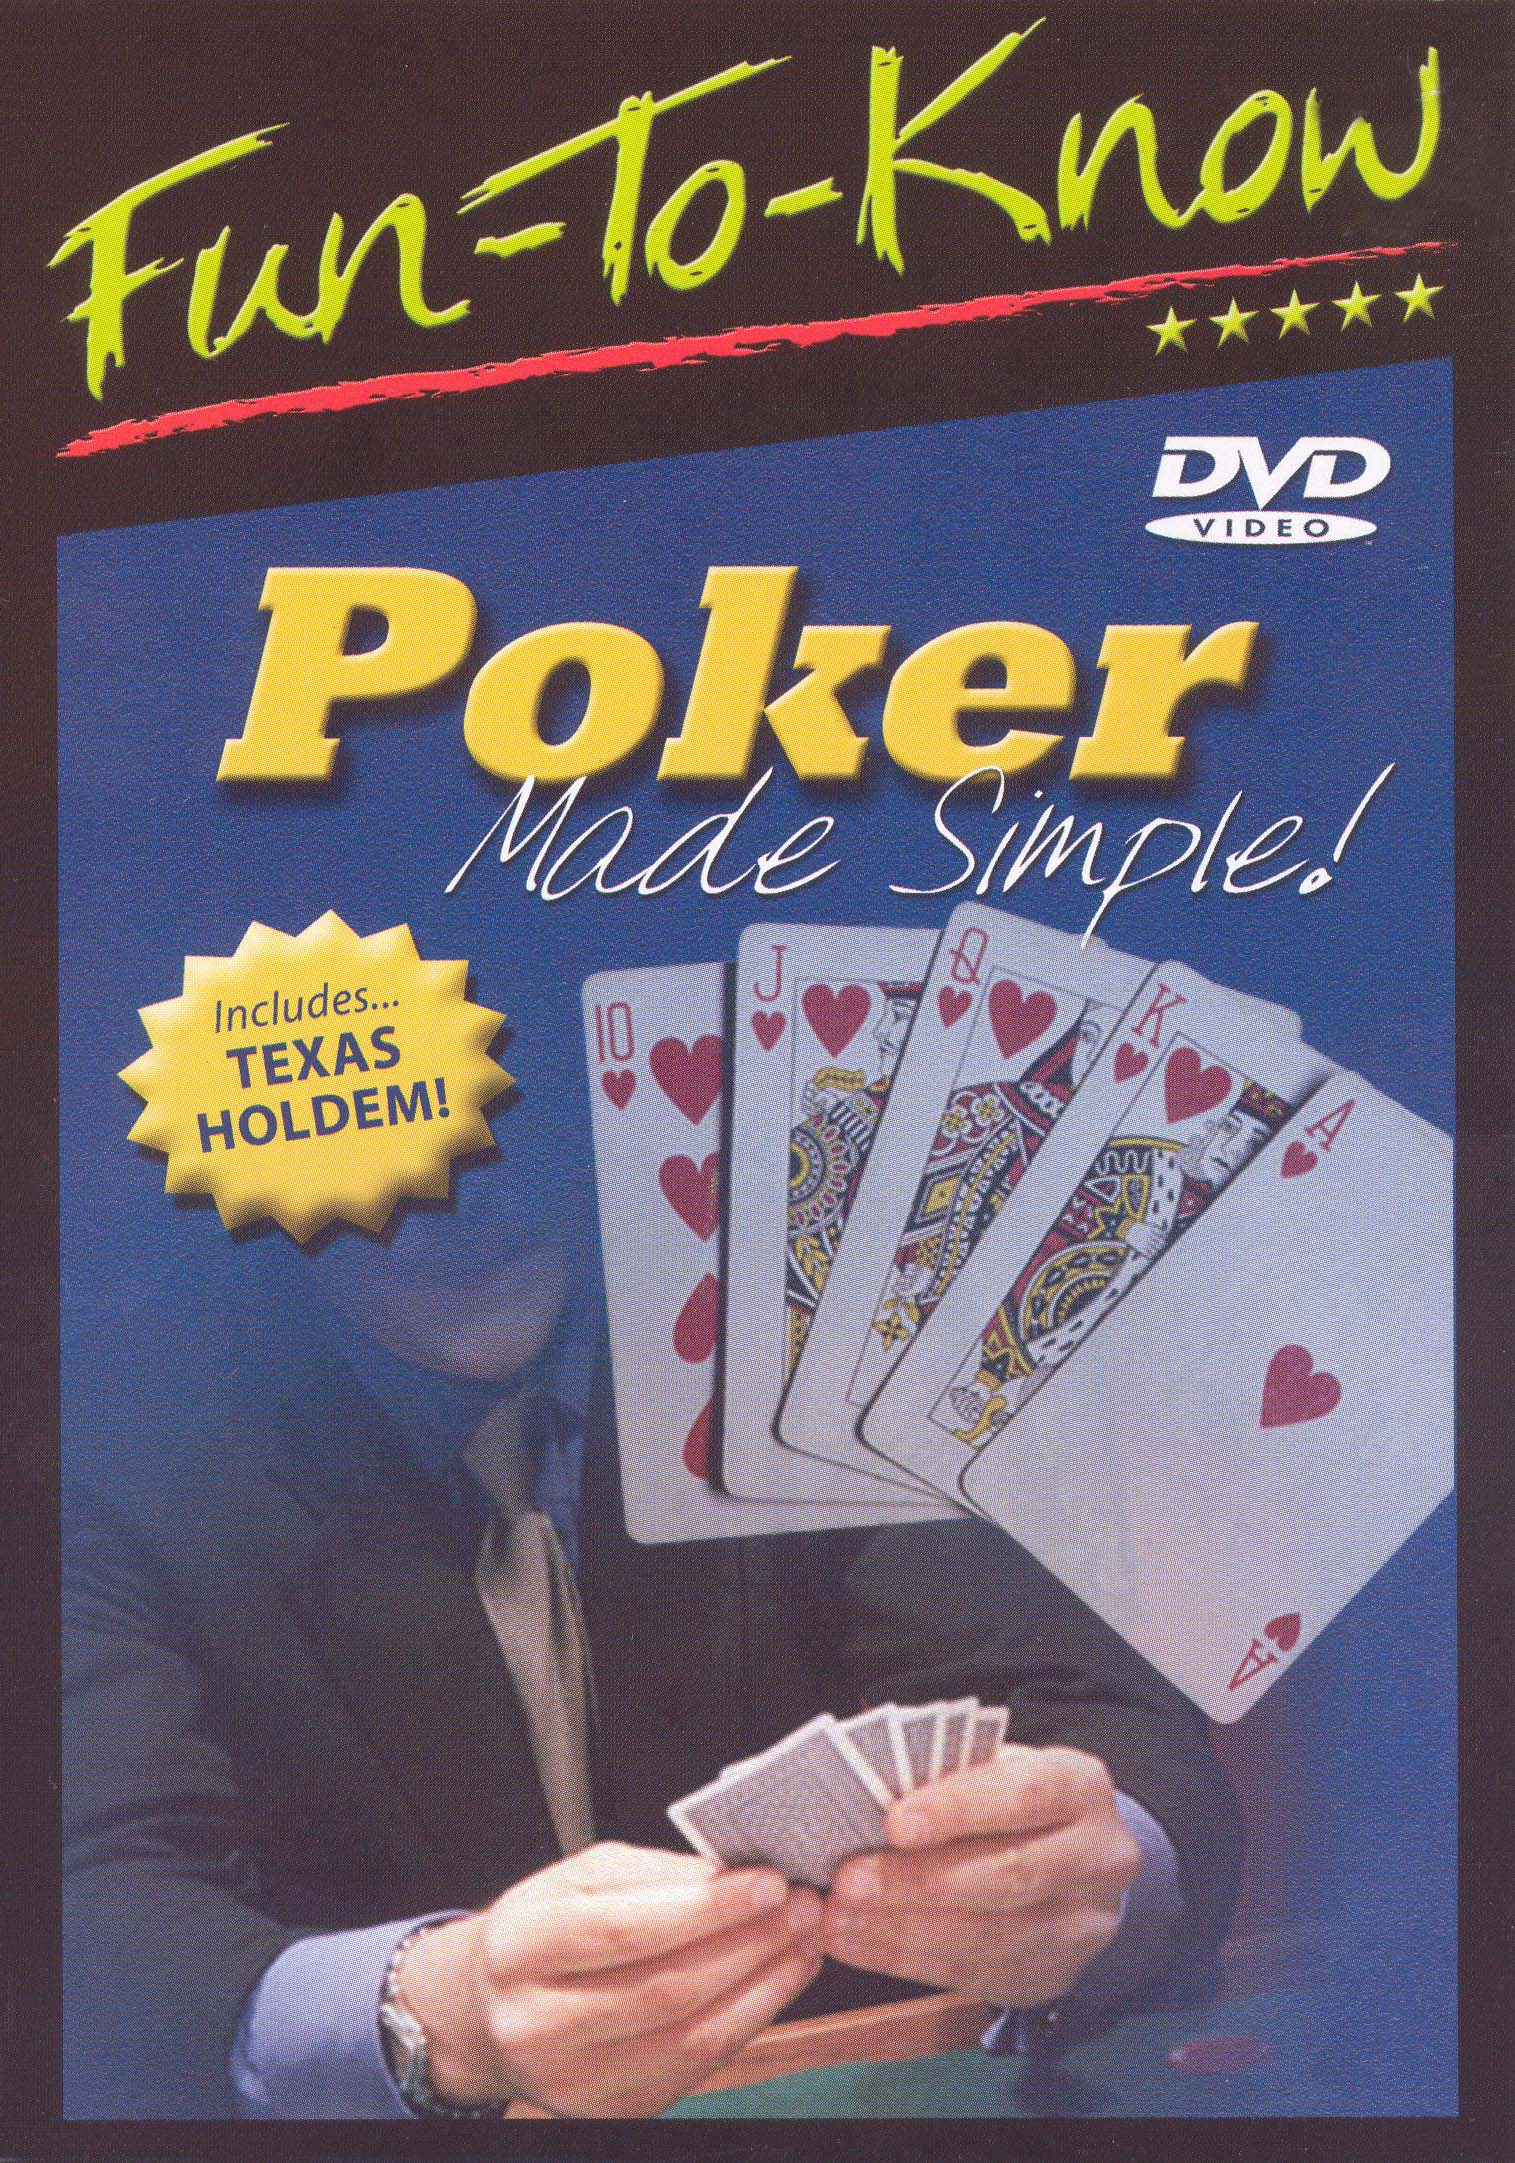 Fun To Know: Poker Made Simple